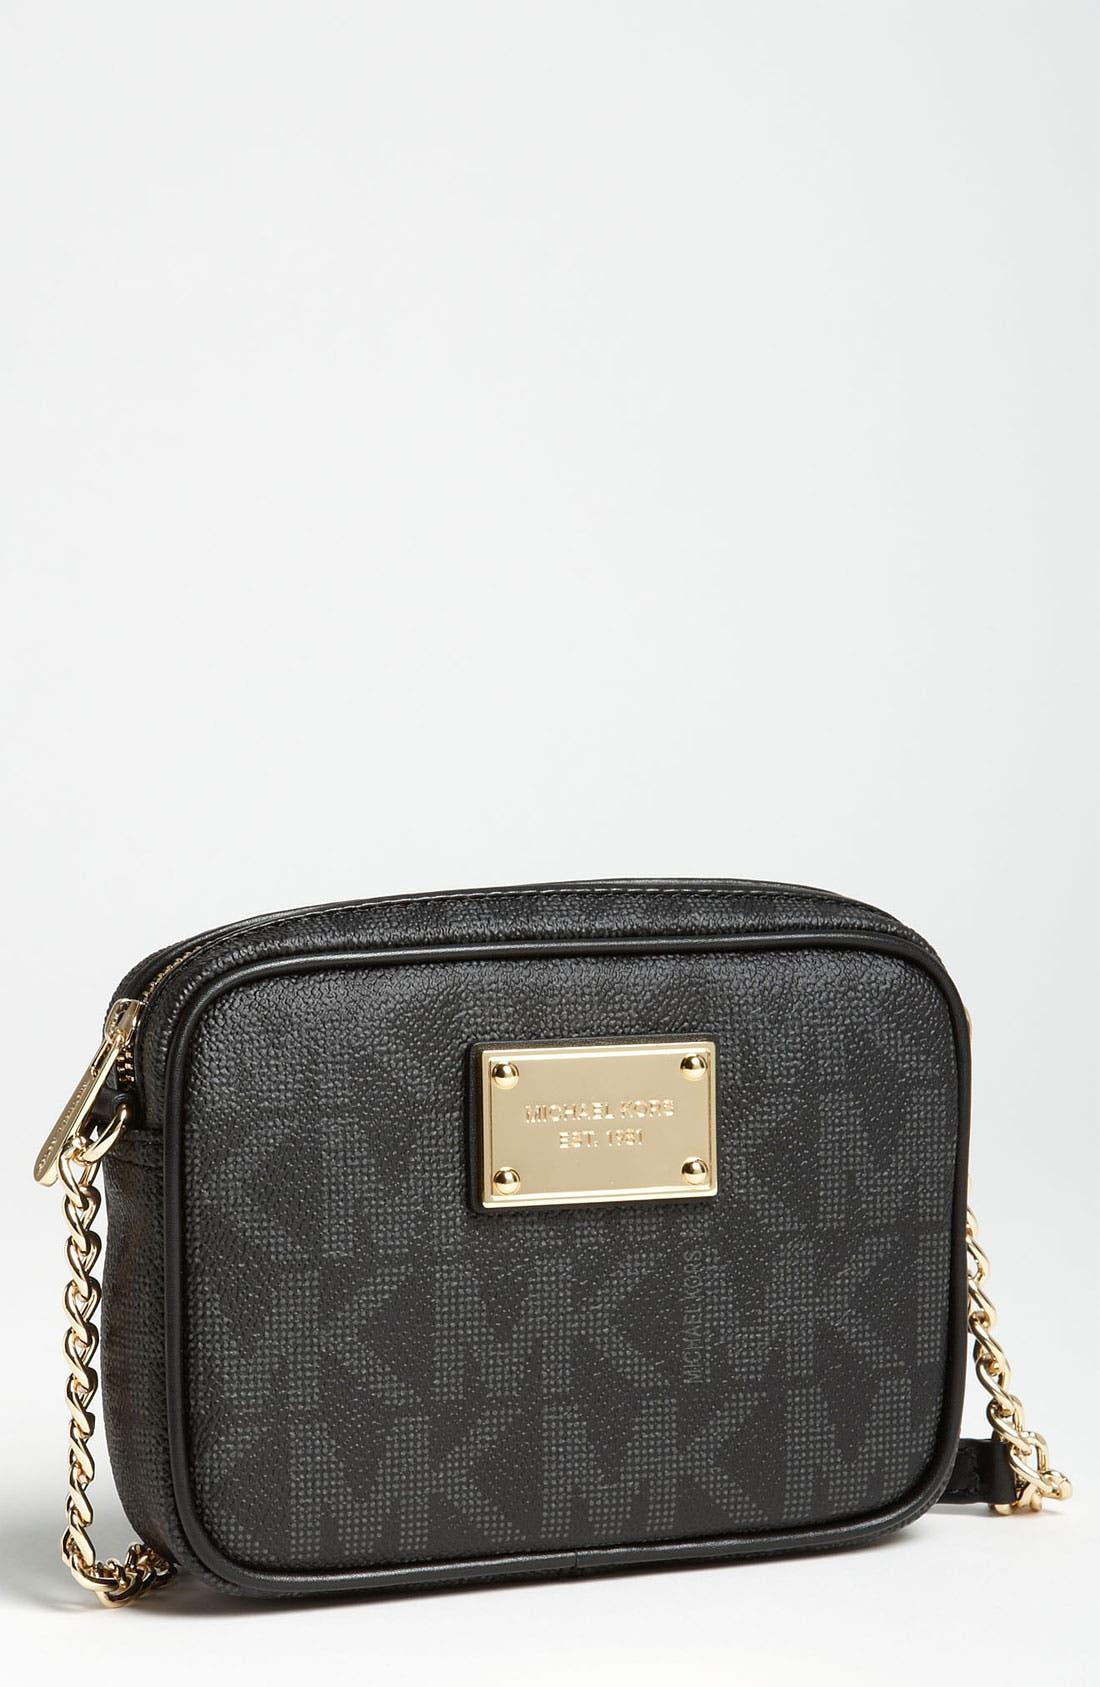 Main Image - MICHAEL Michael Kors 'Small' Crossbody Bag